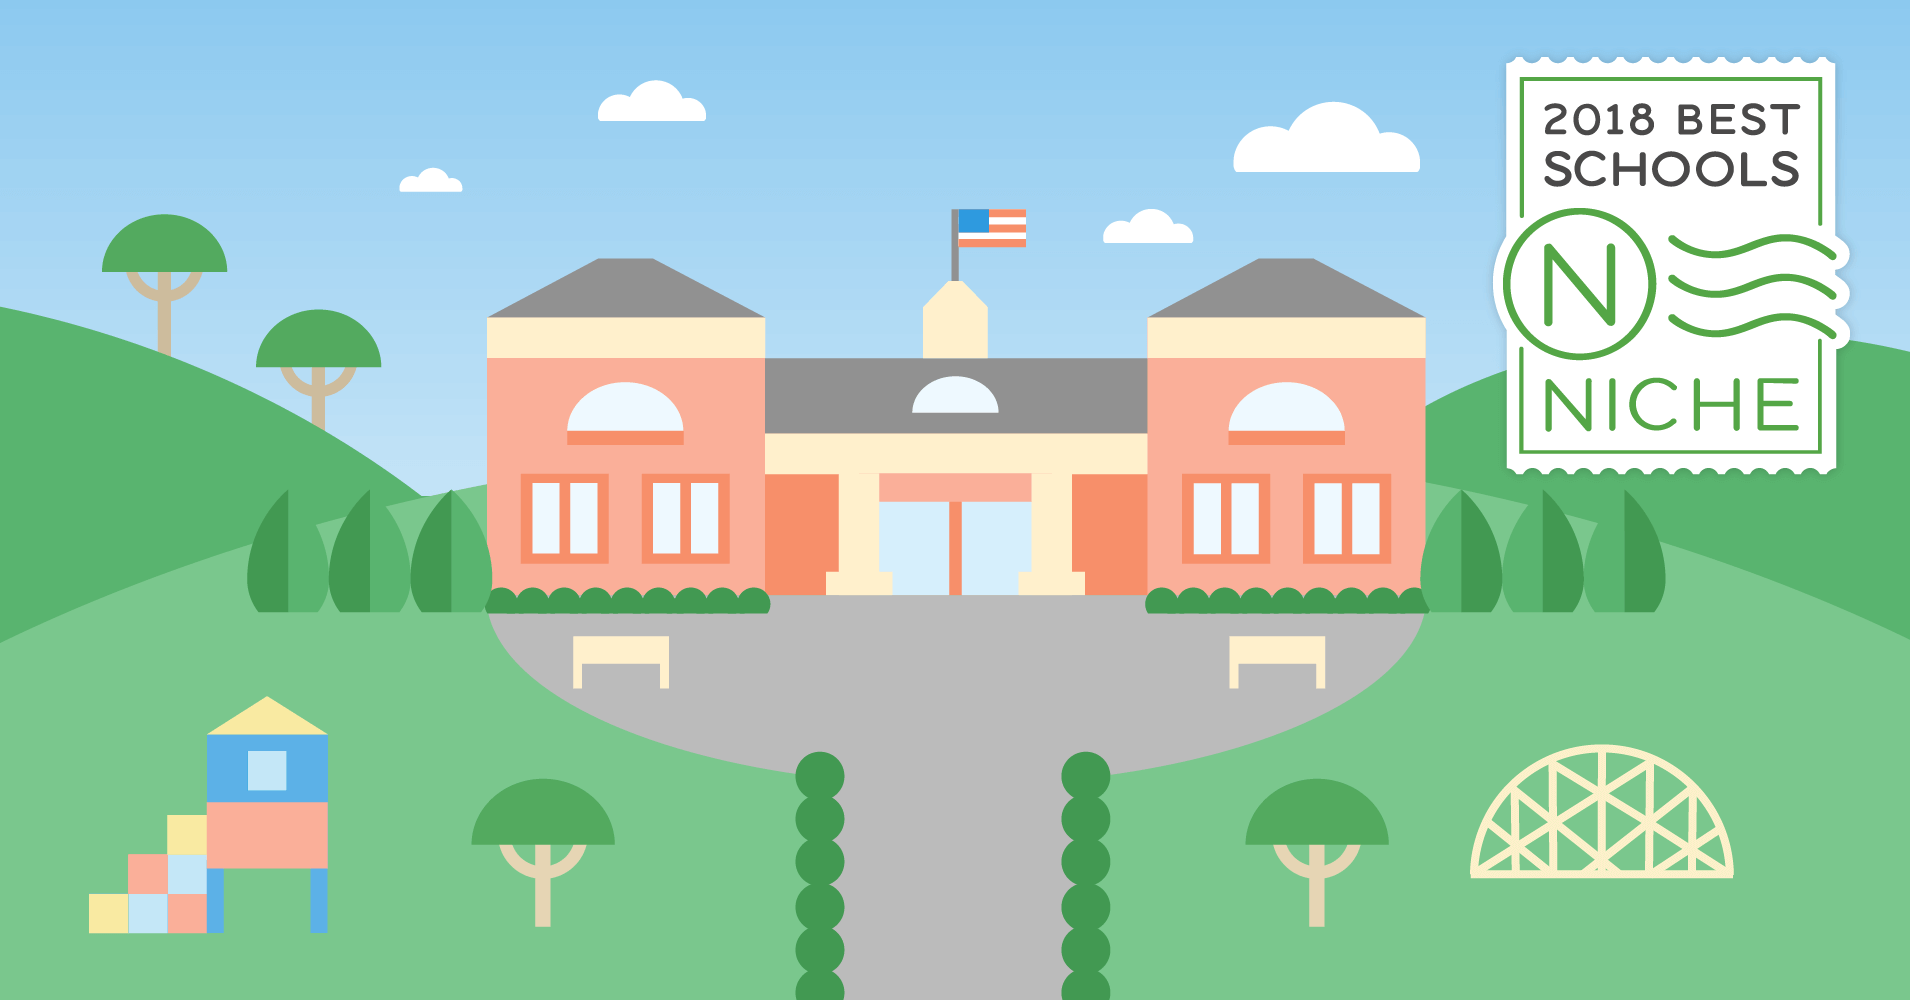 Best Public Elementary Schools In America Niche - Easily coolest school world